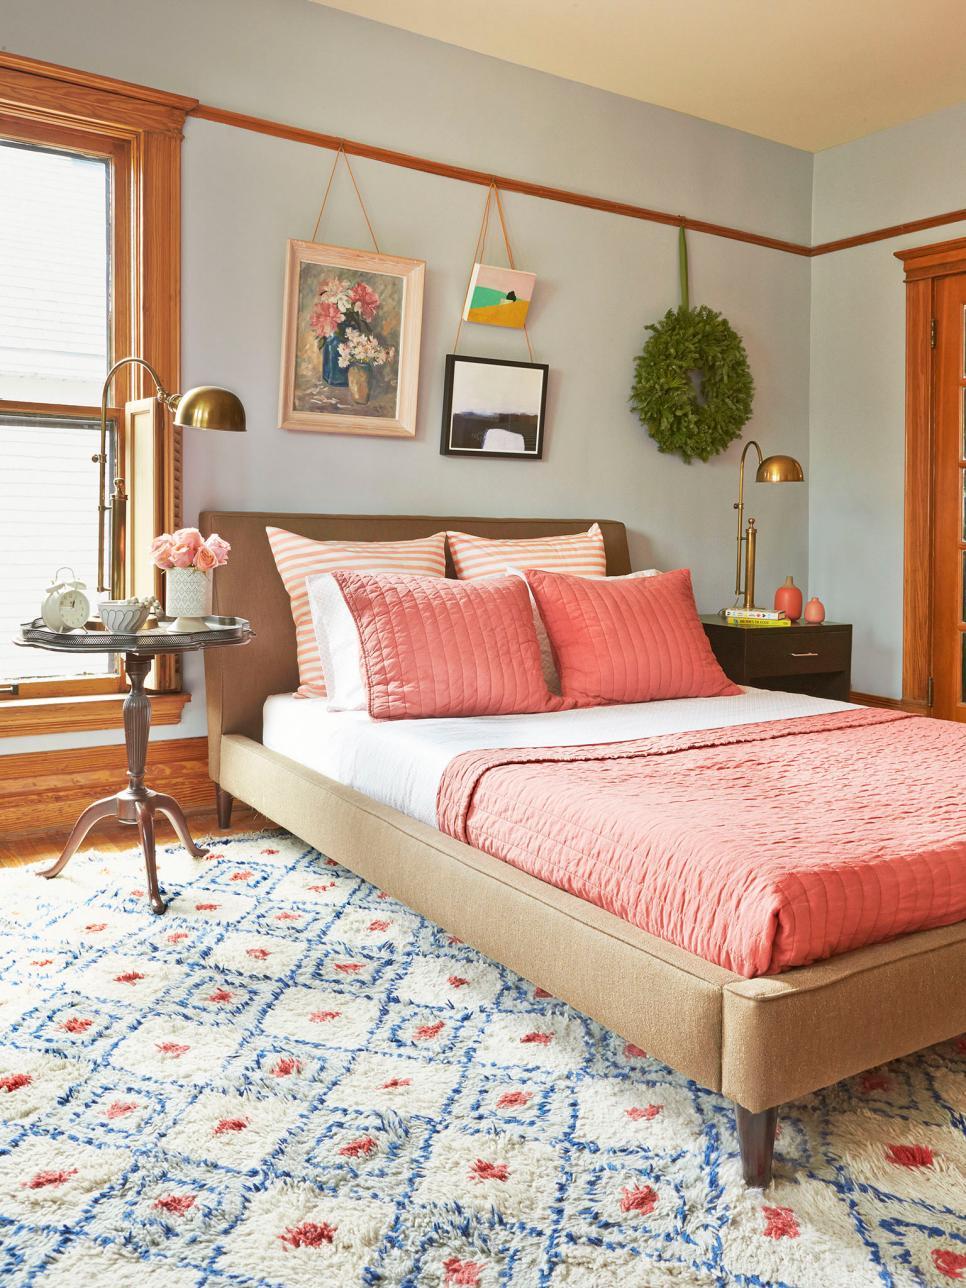 Making it Lovely's Bedroom in HGTV Magazine's Christmas 2015 Issue